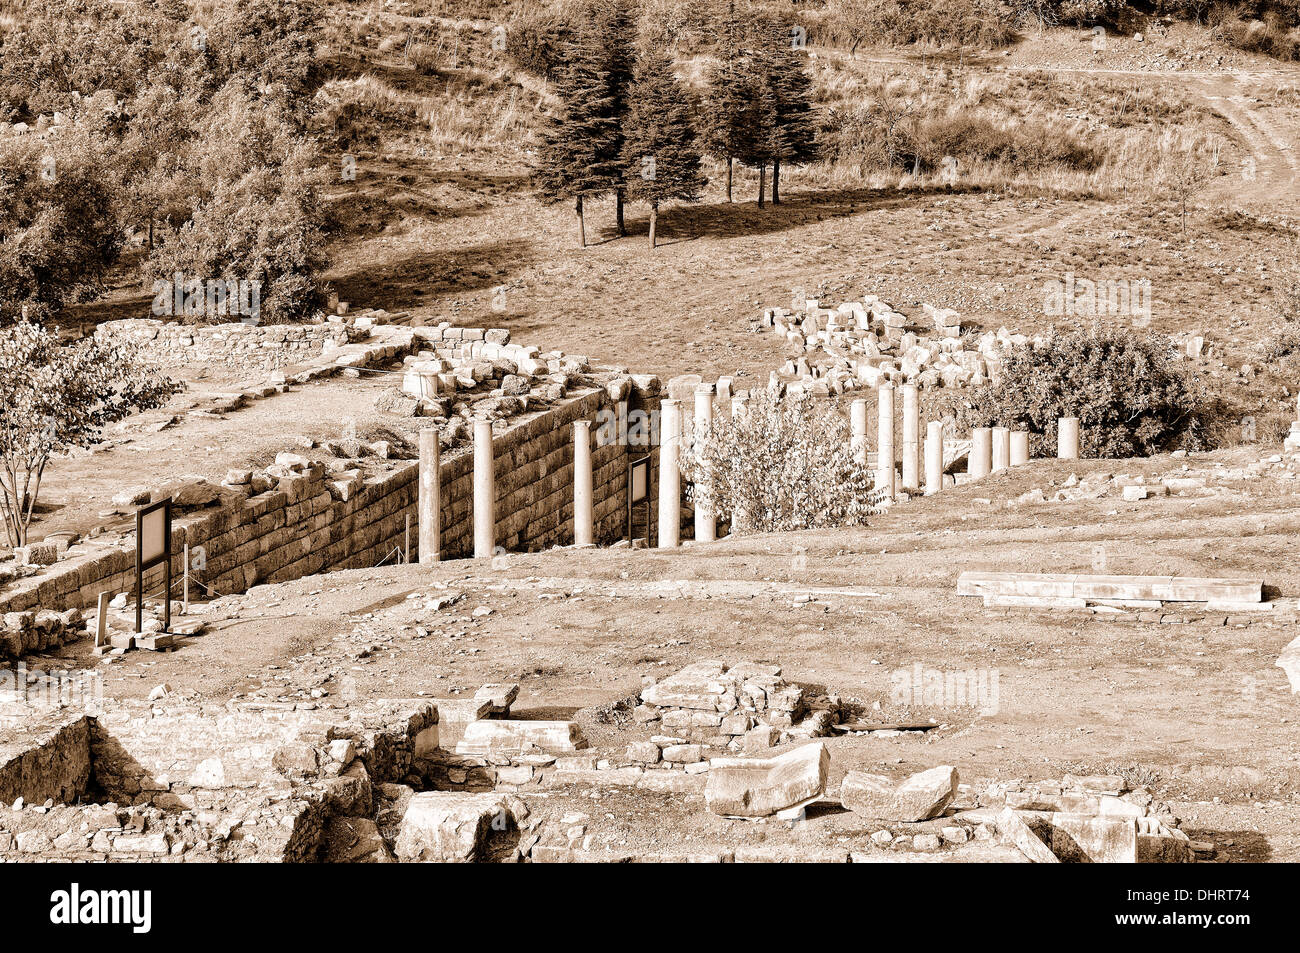 Pilgrimage route Ephesus Turkey sepia - Stock Image